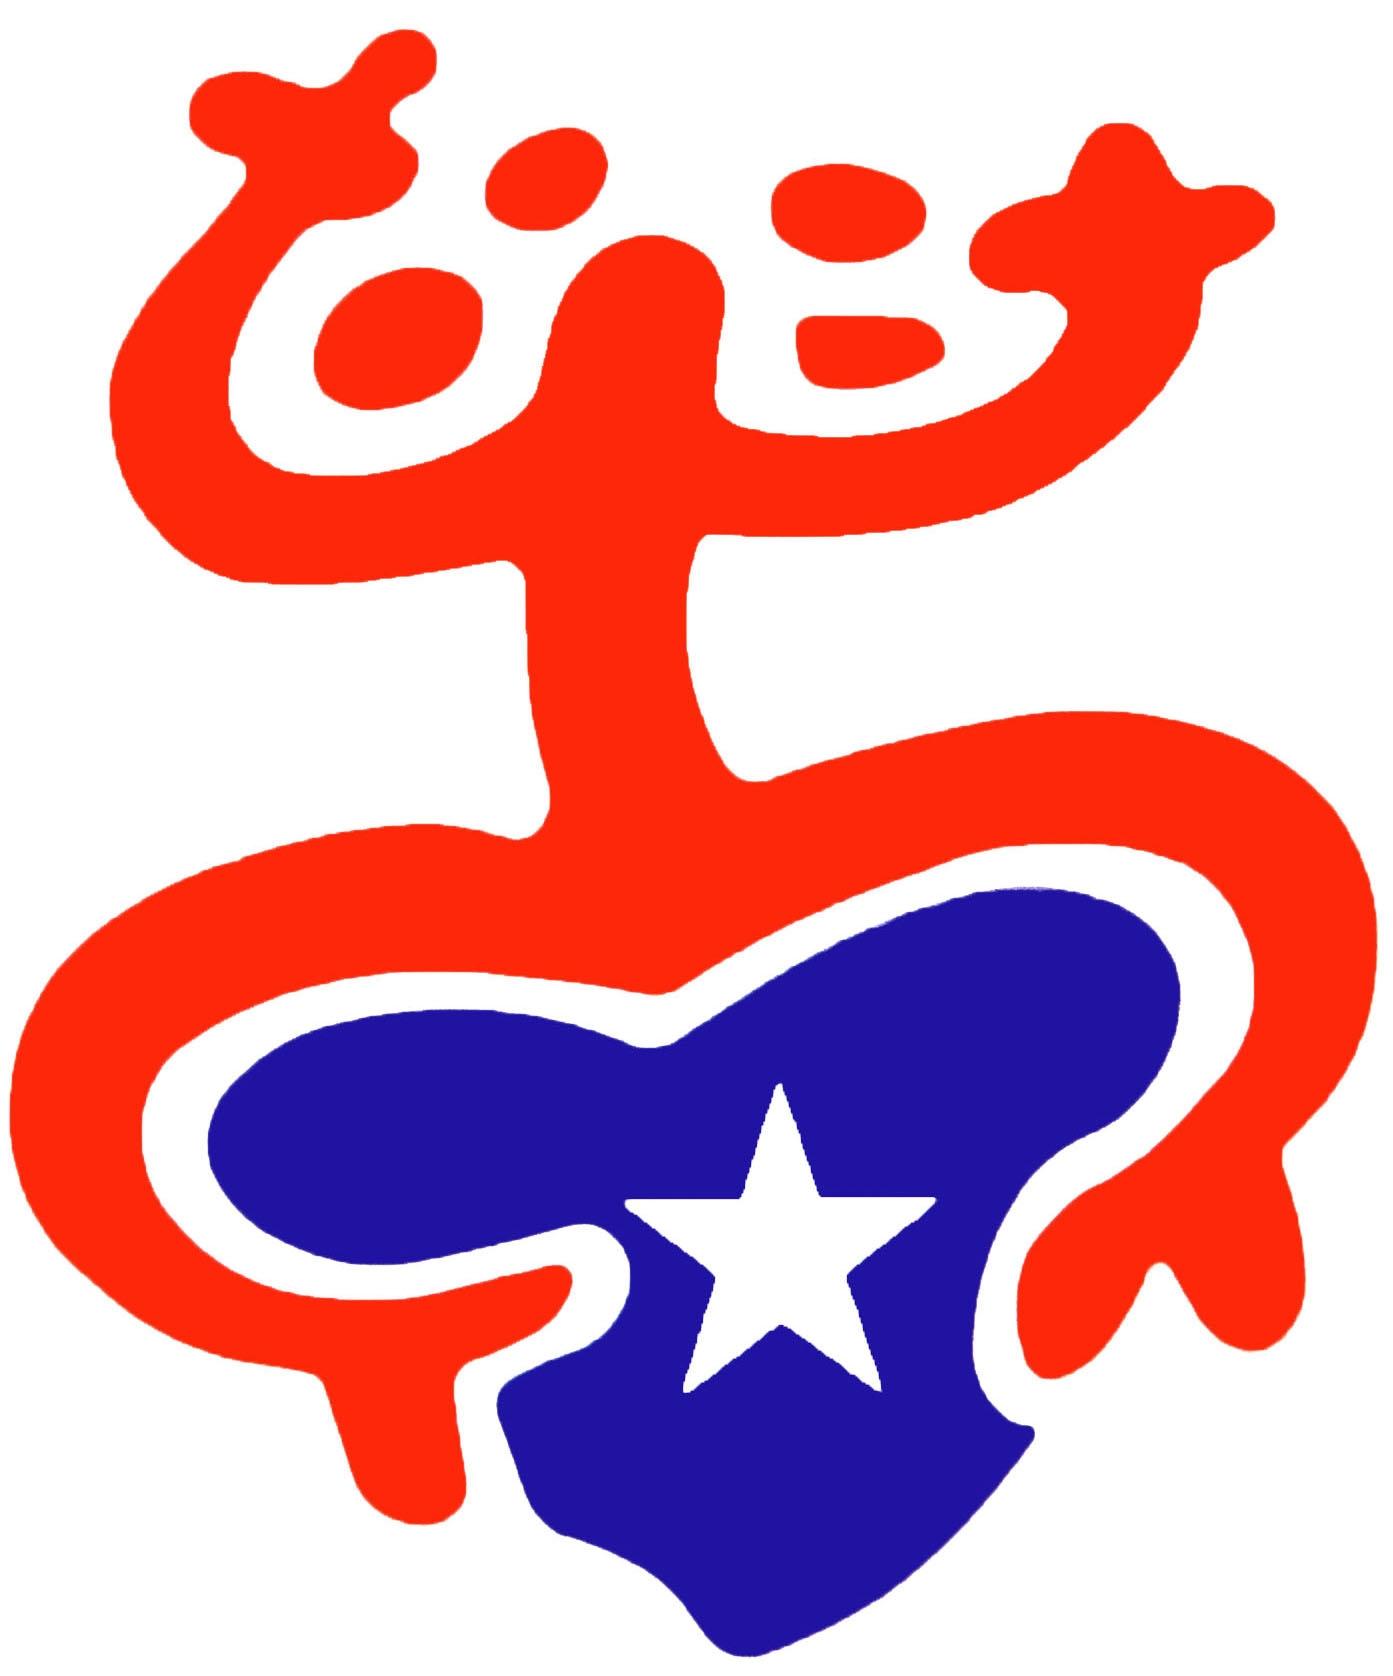 puerto rico clipart at getdrawings com free for personal use rh getdrawings com puerto rico outline clip art puerto rico clipart svg